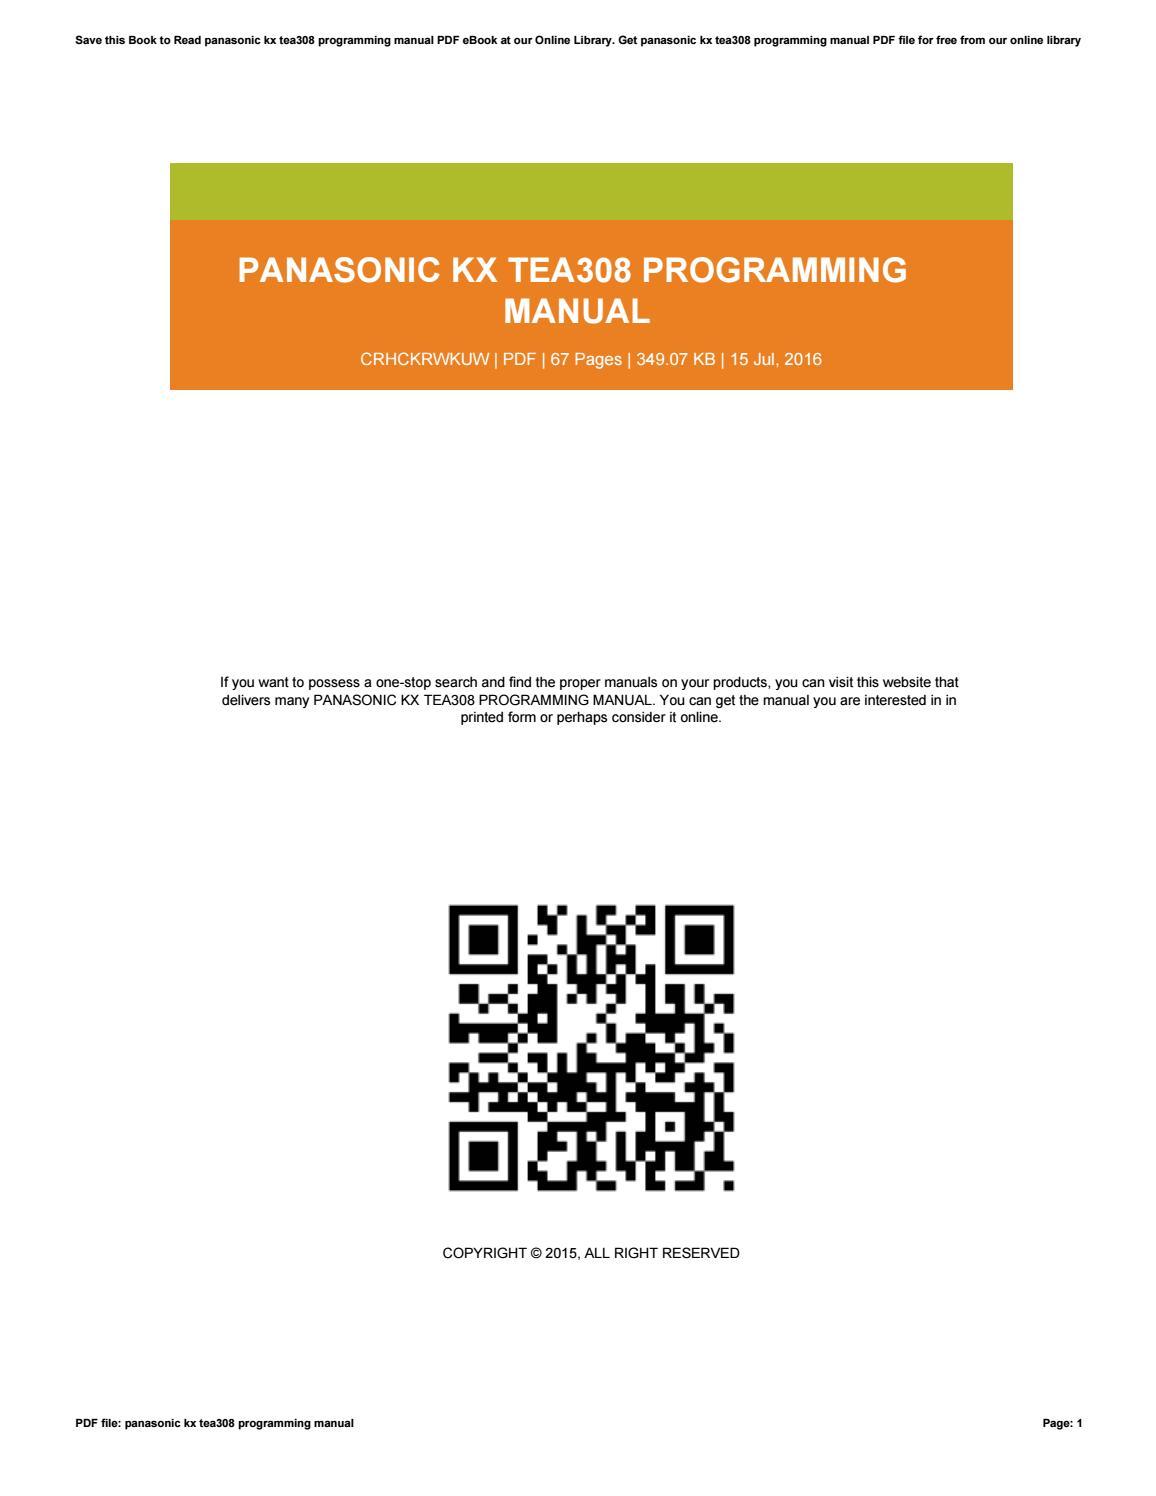 Panasonic kx-ta824 pbx program console youtube.